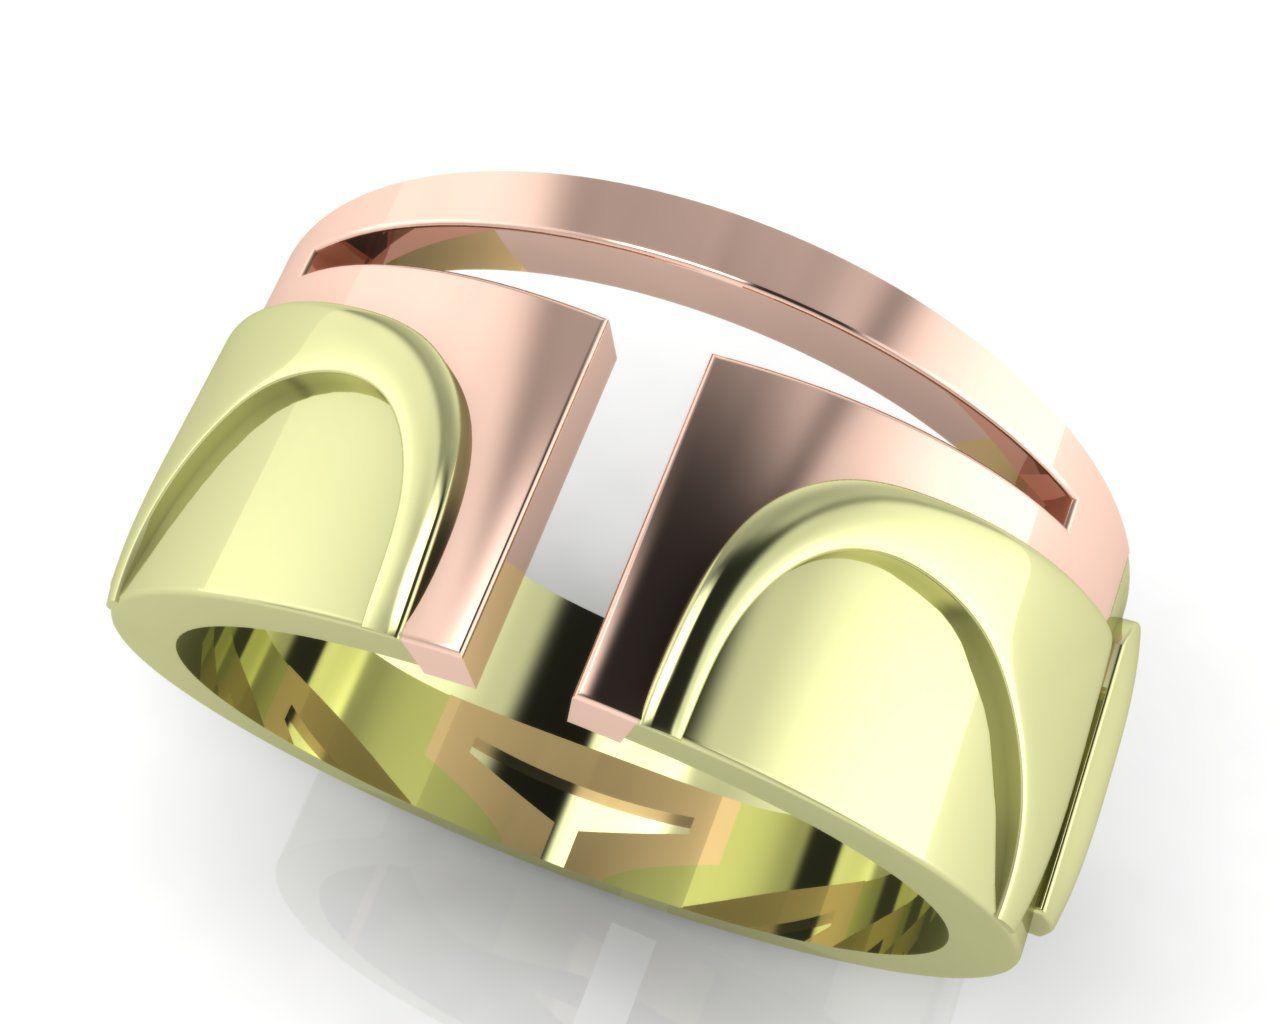 deadpool wedding ring Boba Fett Star Wars engagement ring from Brilliant Earth